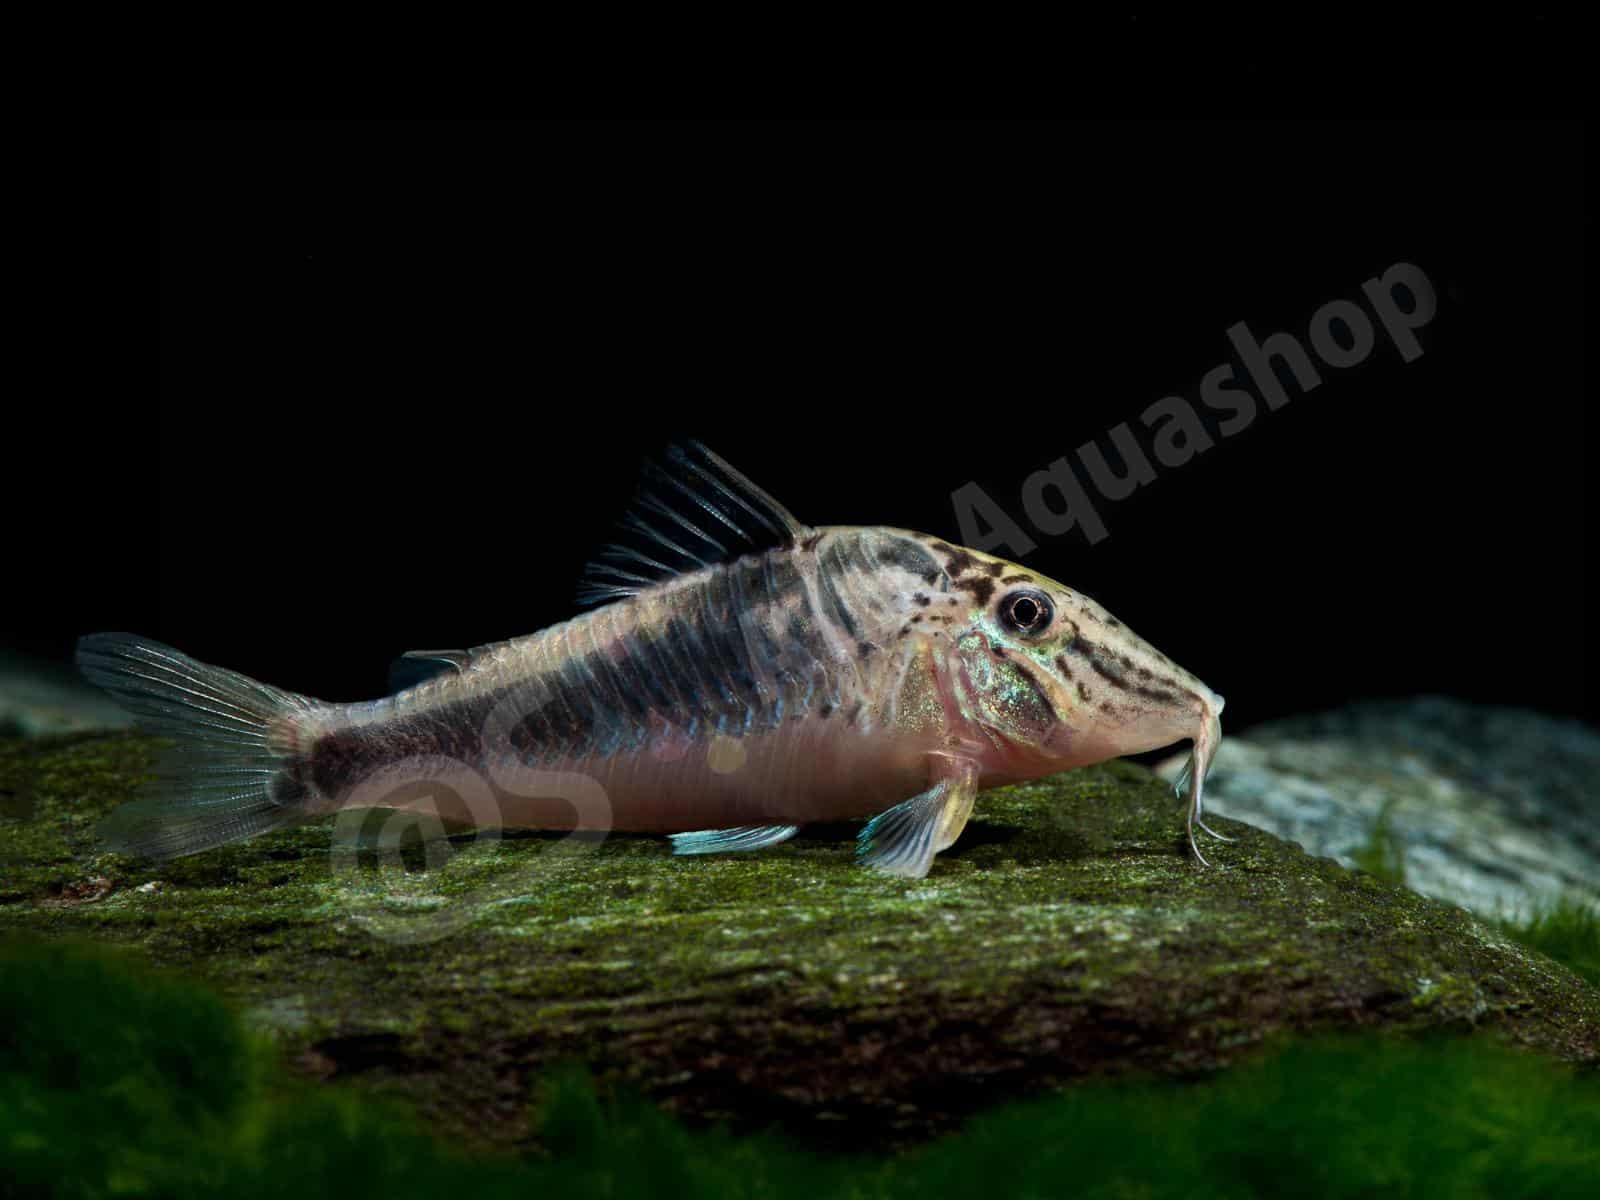 corydoras semiaquilus enrico richter 0145 6